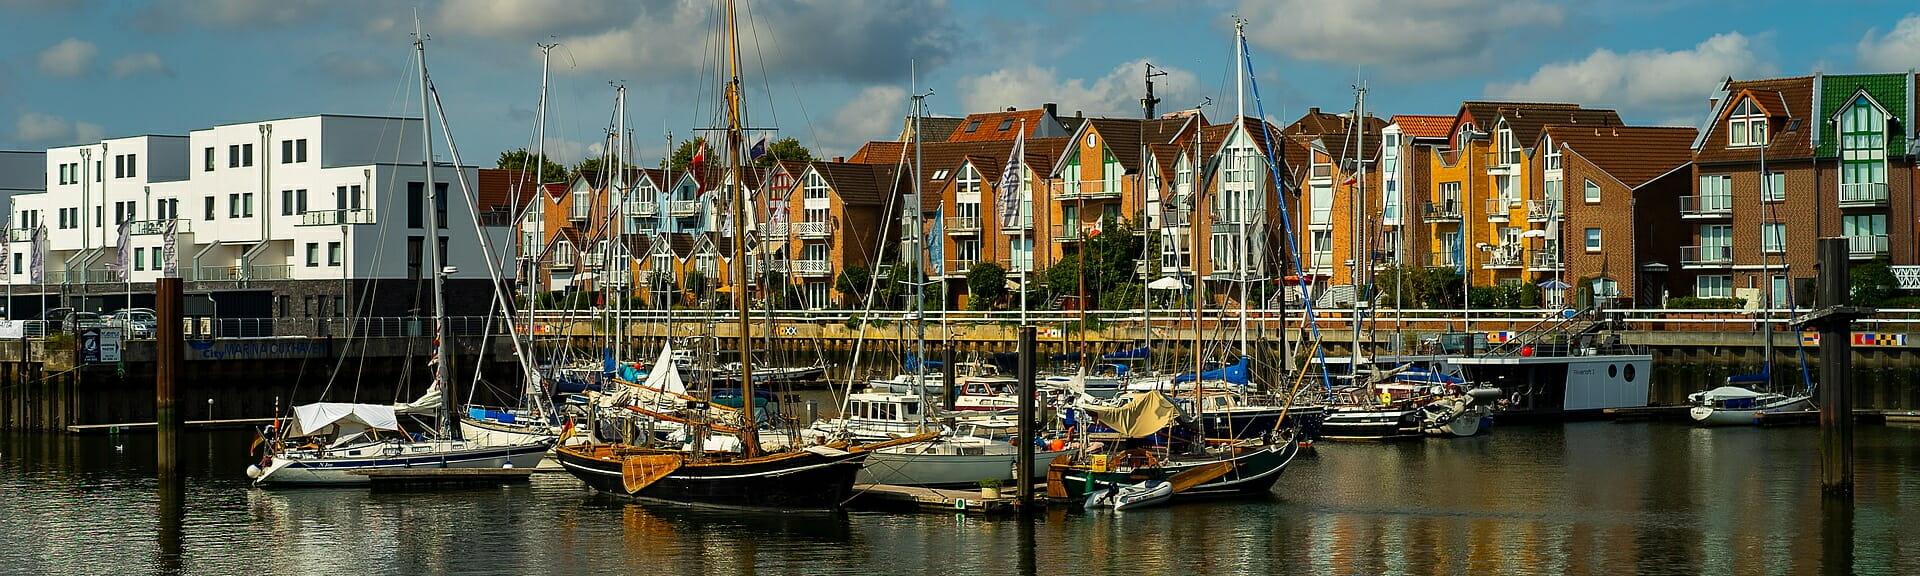 Klassenfahrt Cuxhaven Hafen